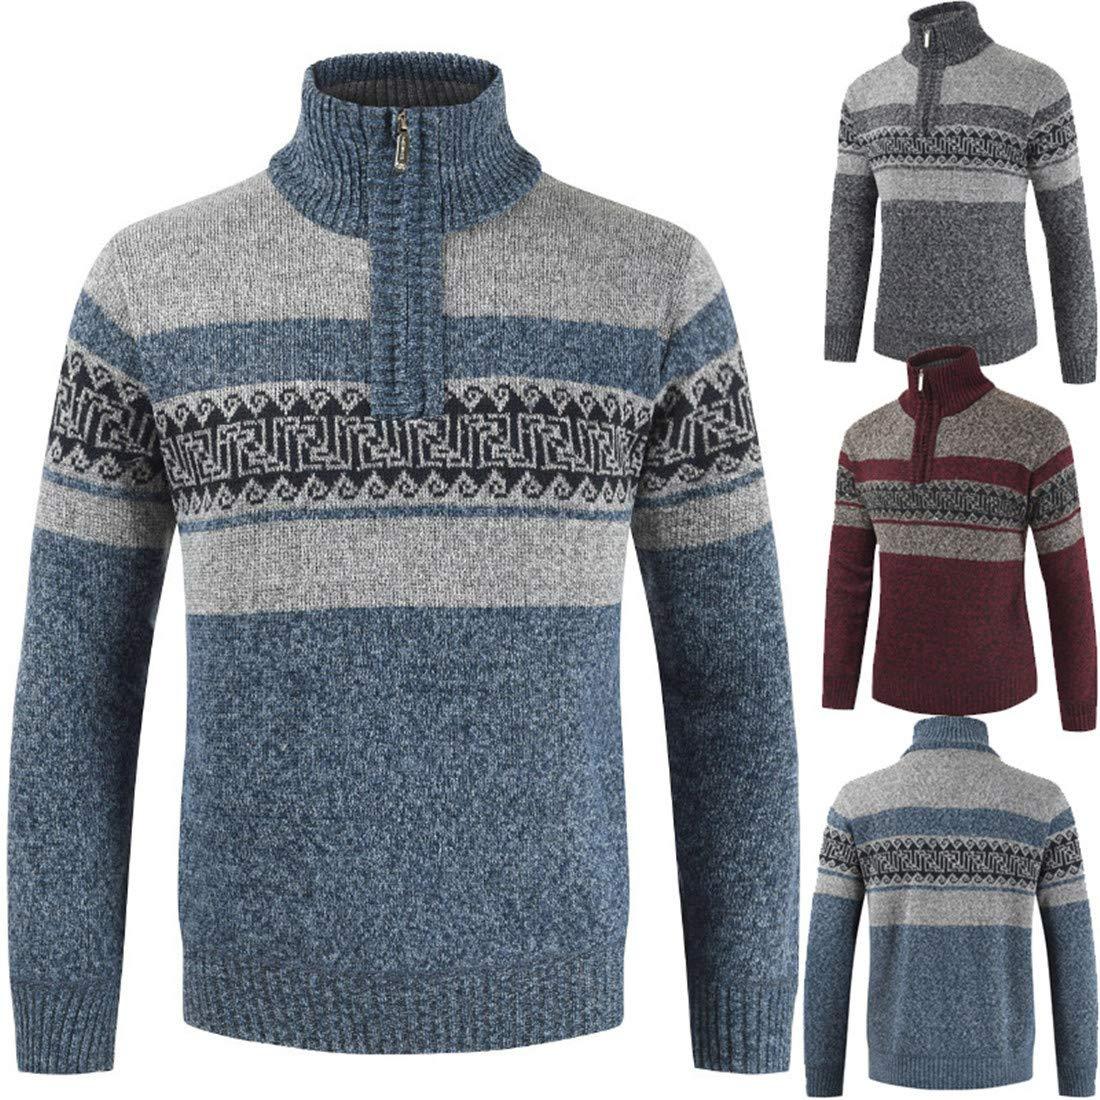 CAI&HONG-GUO GCH Herren Pullover Mode Plus SAMT